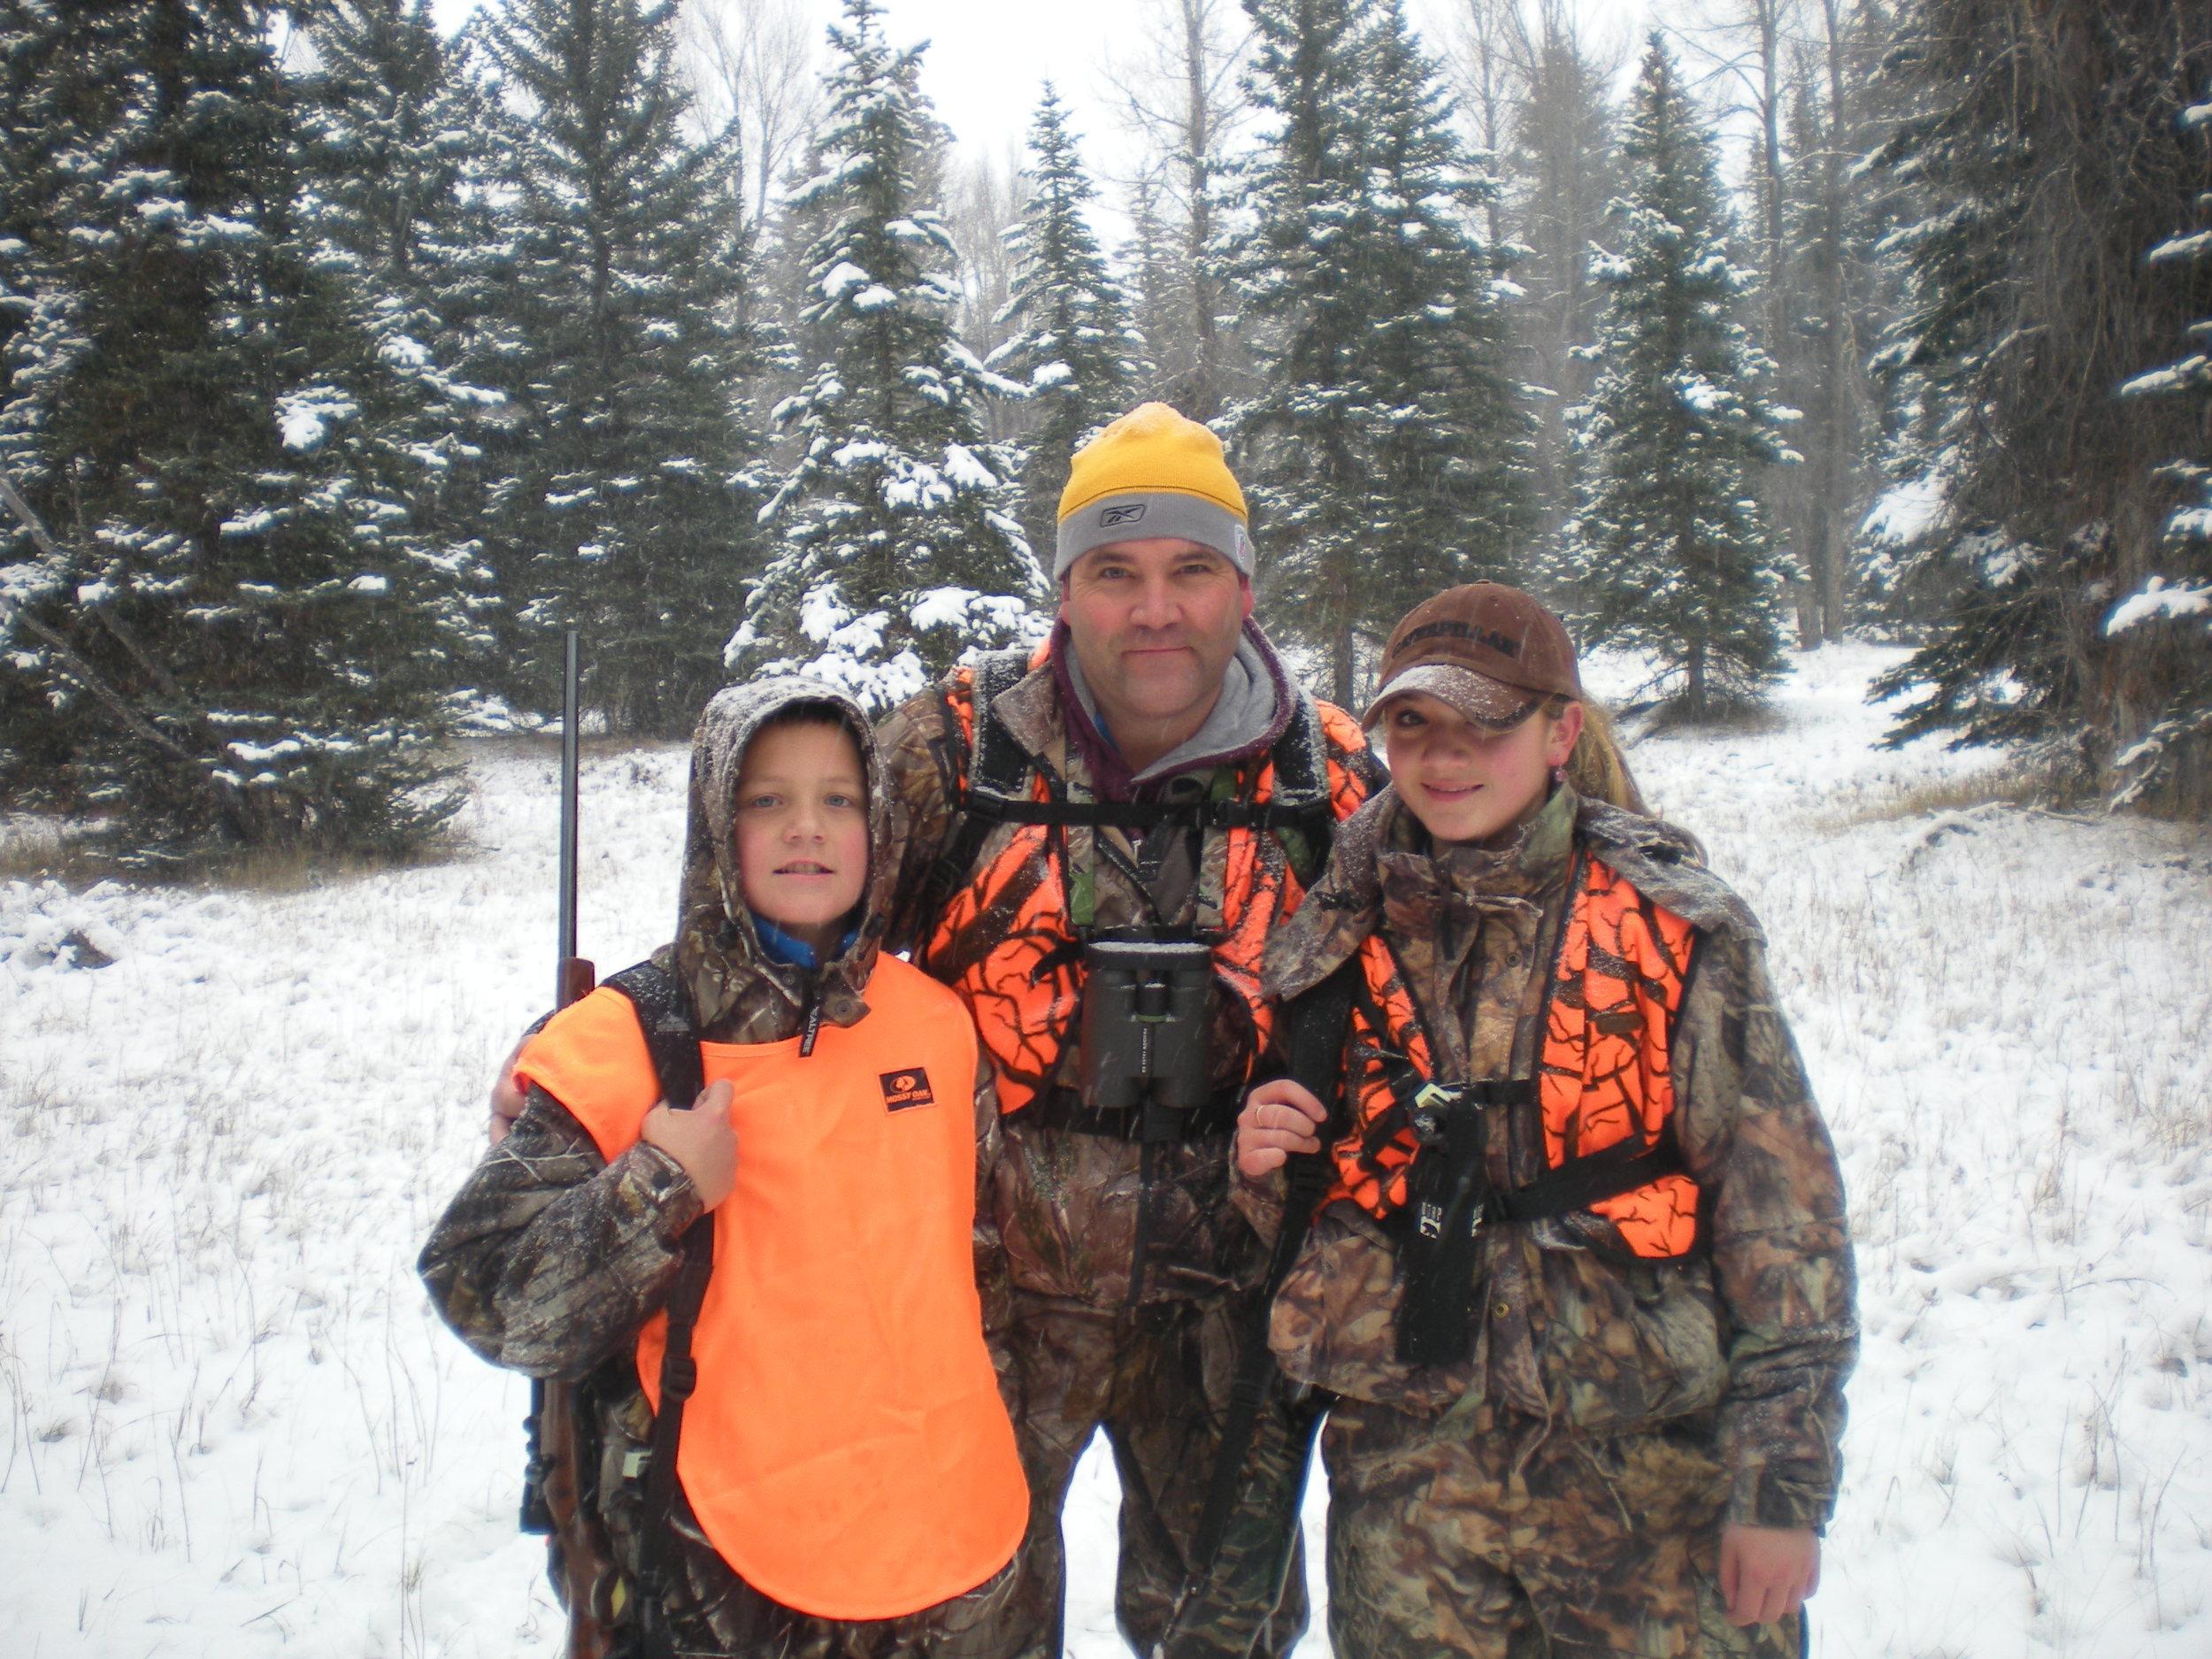 Jerry, Taylor, & Jordan Kelly enjoying healthy forests